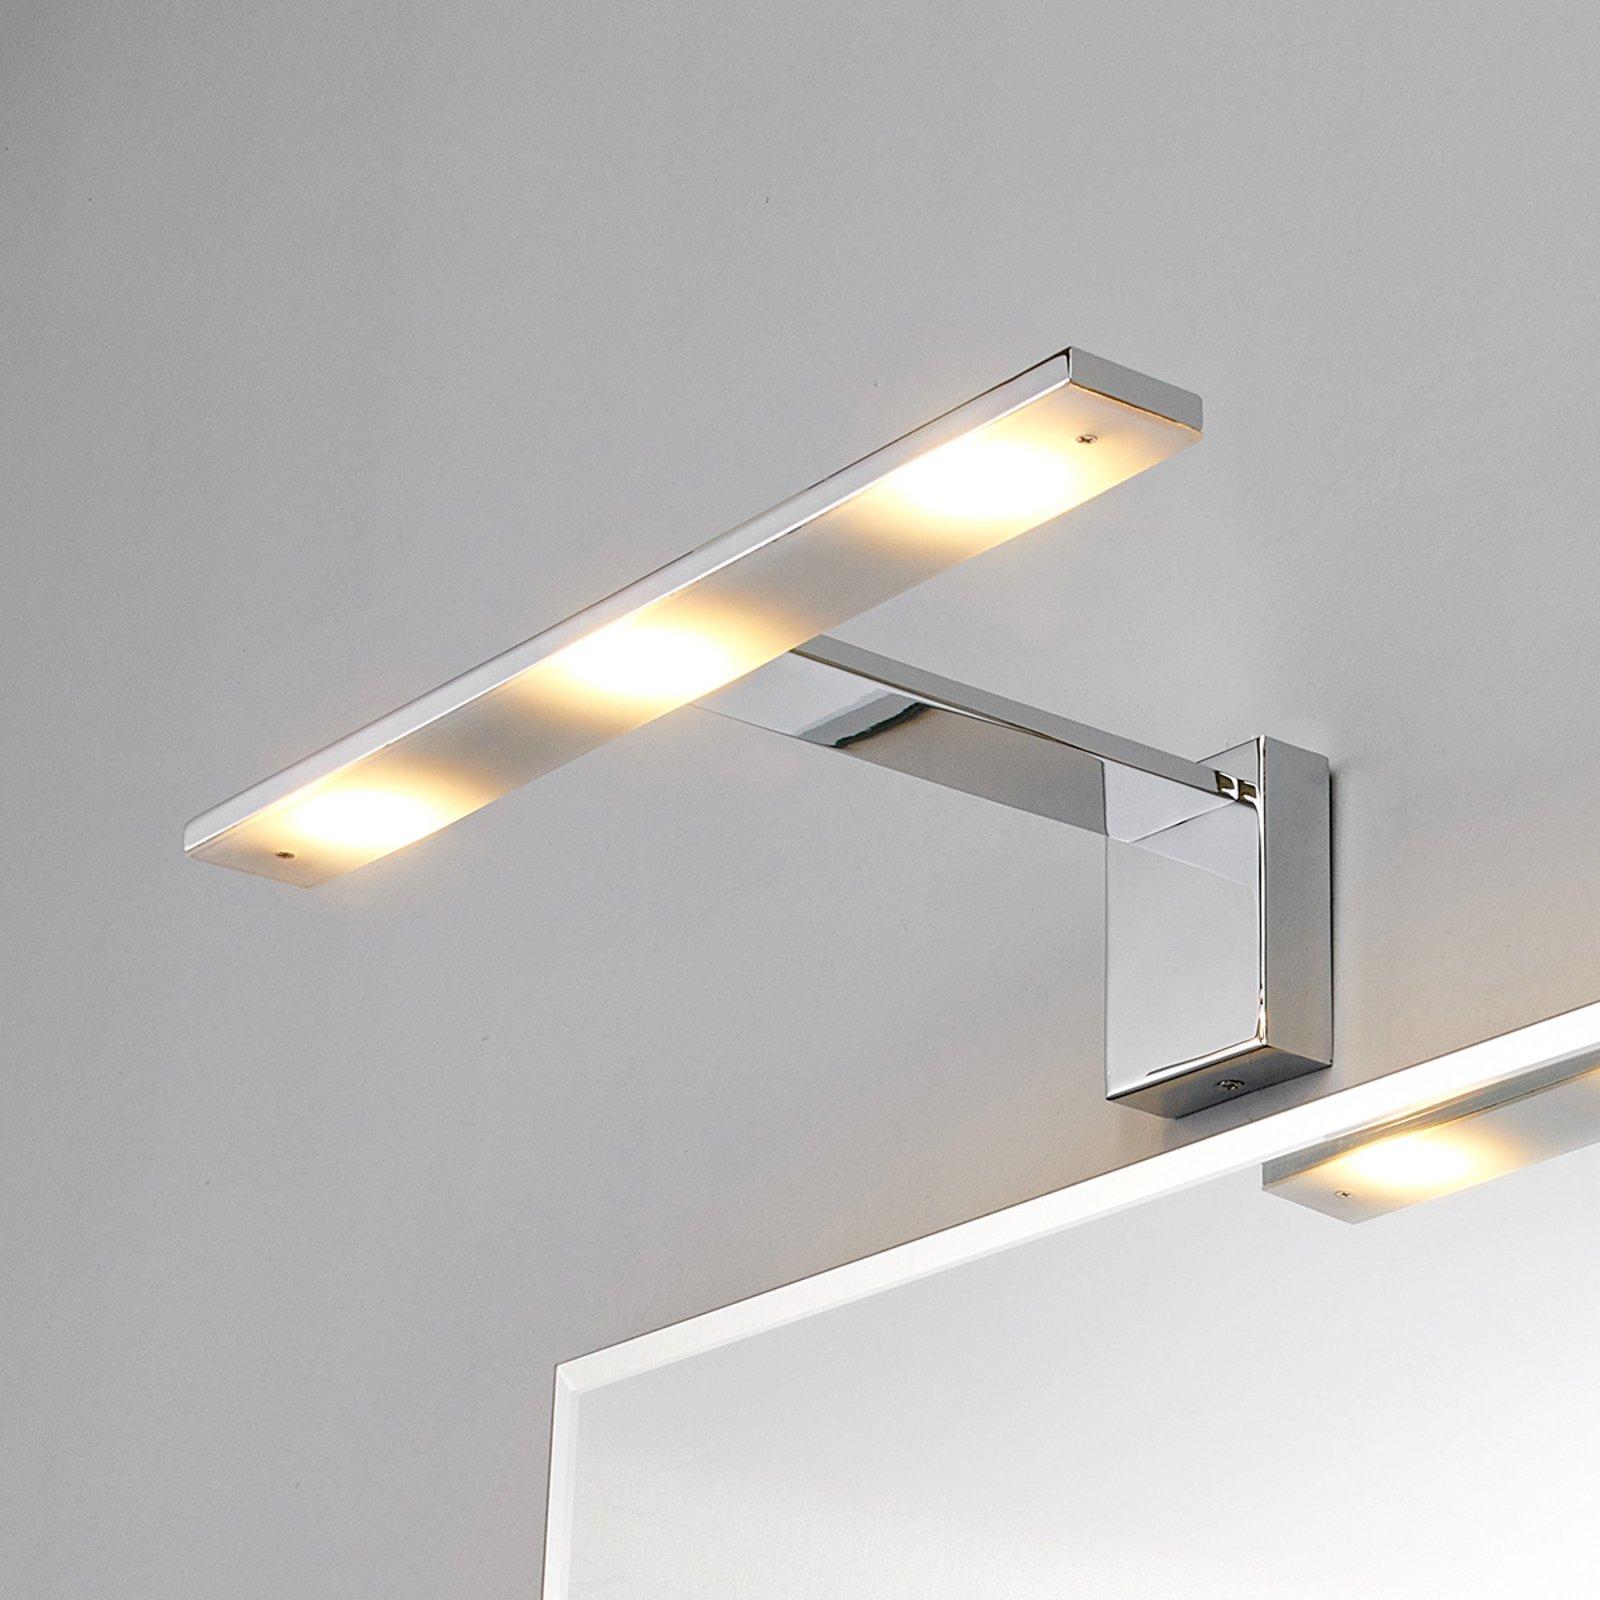 Chic LED-speillampe Lorik, krom